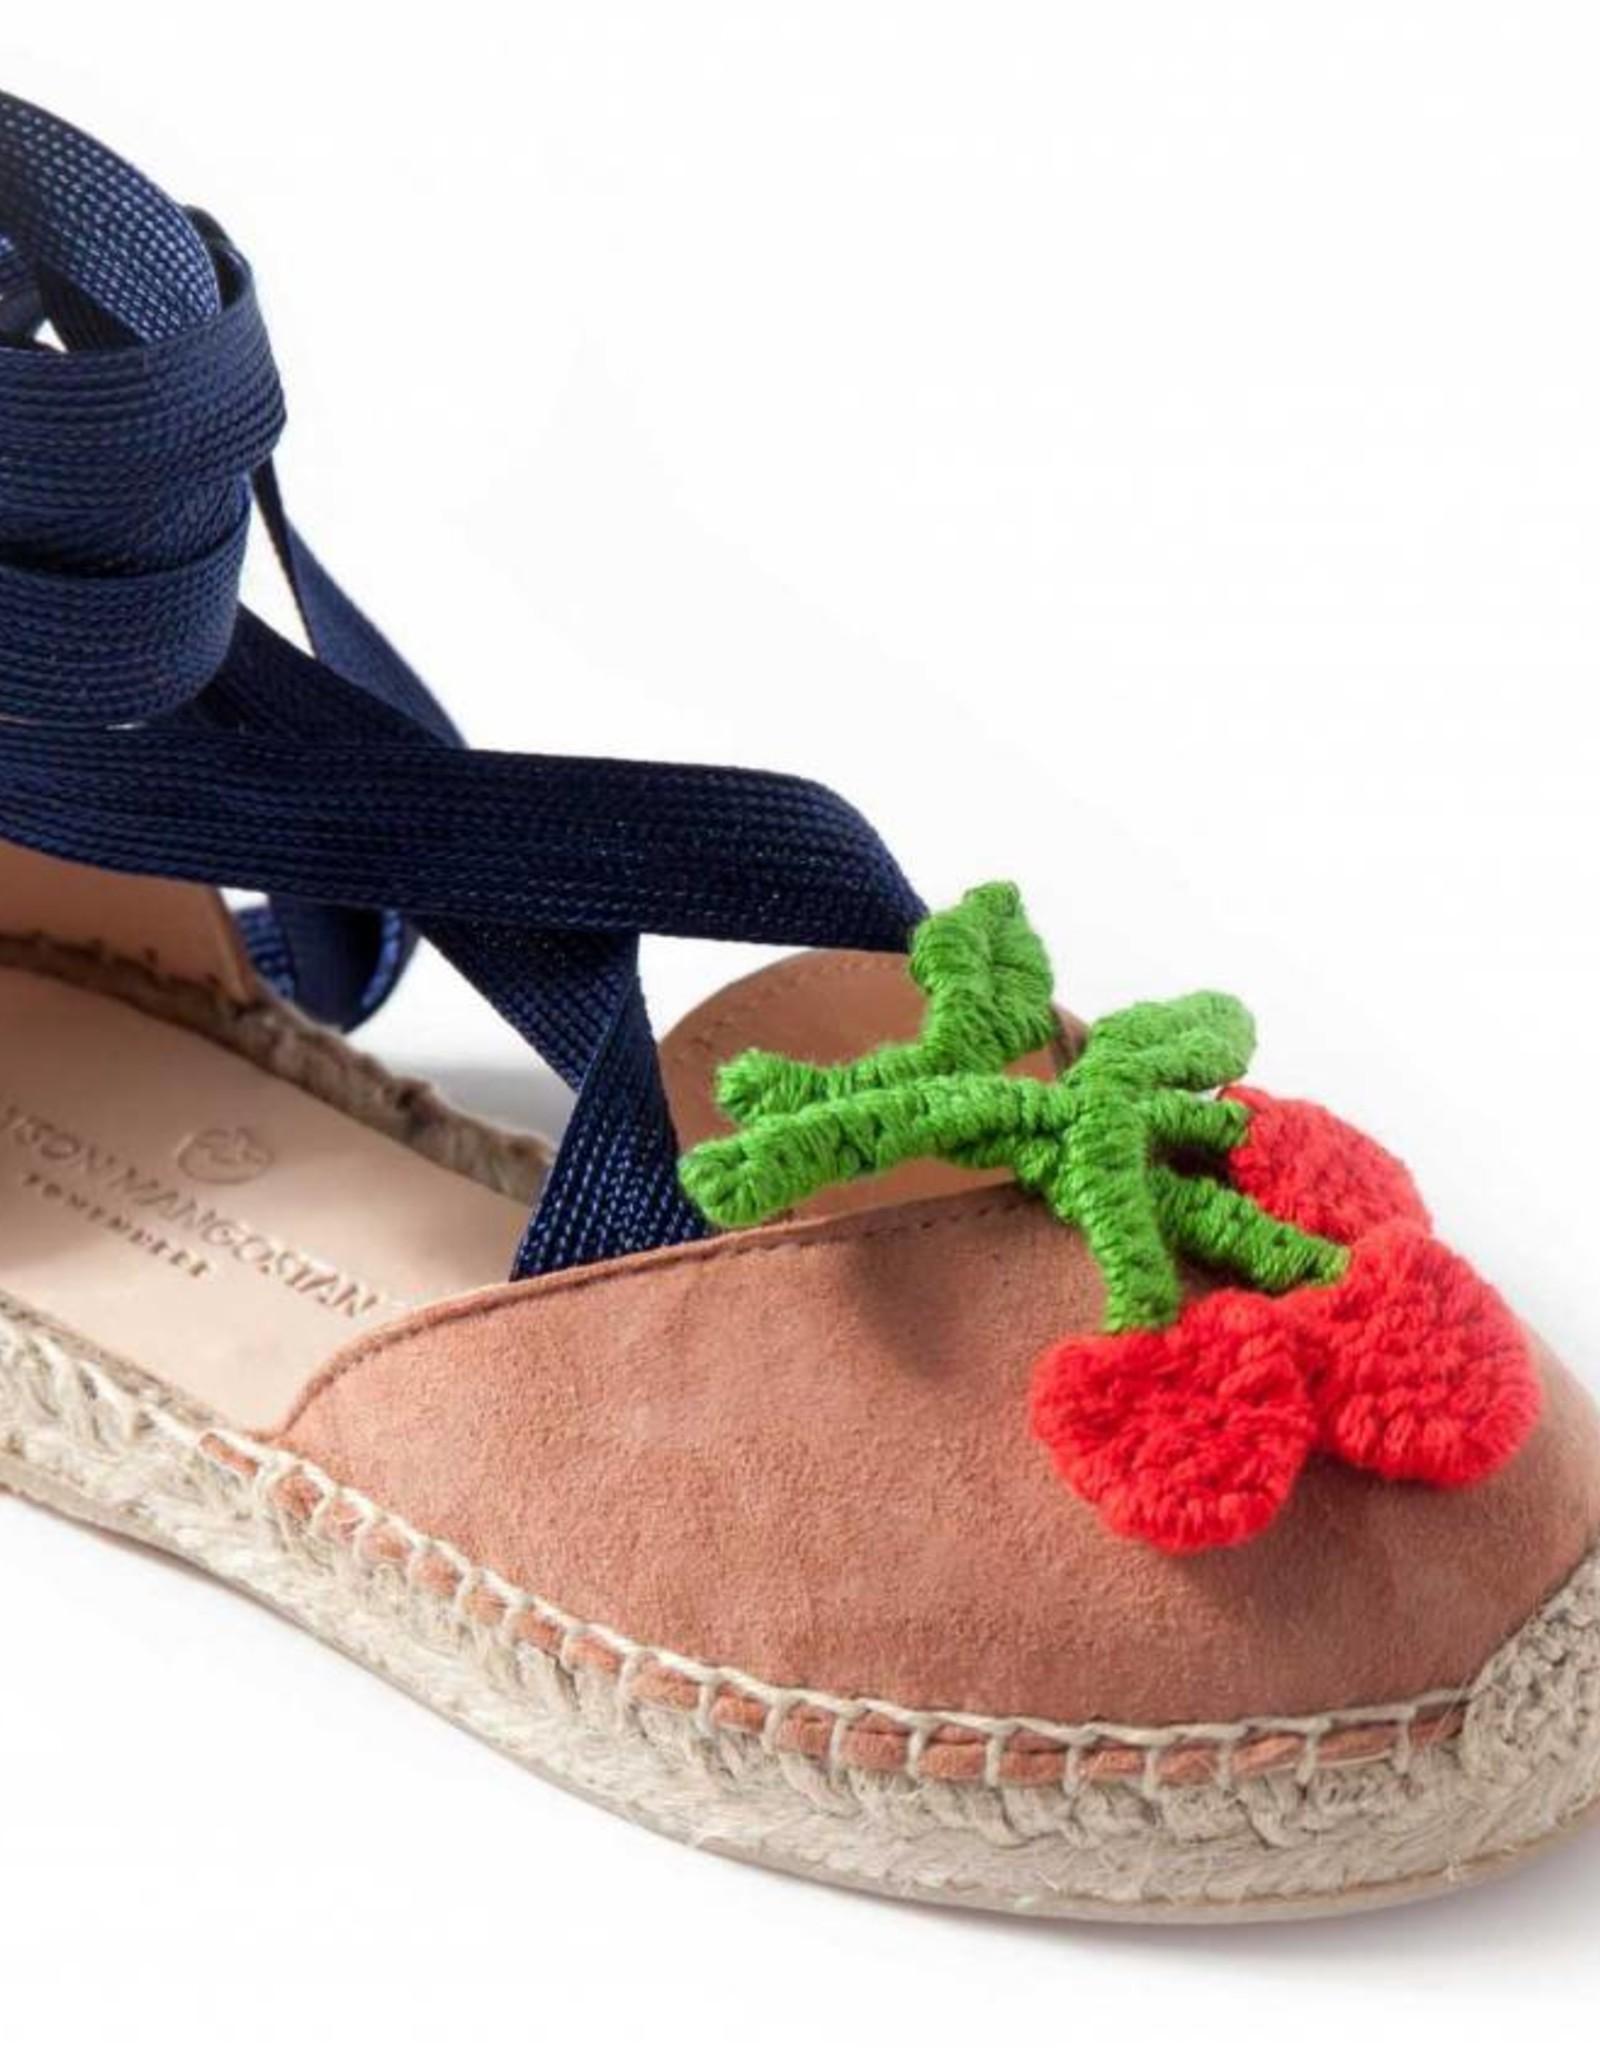 Maison Mangostan Macedonia cherry sandals